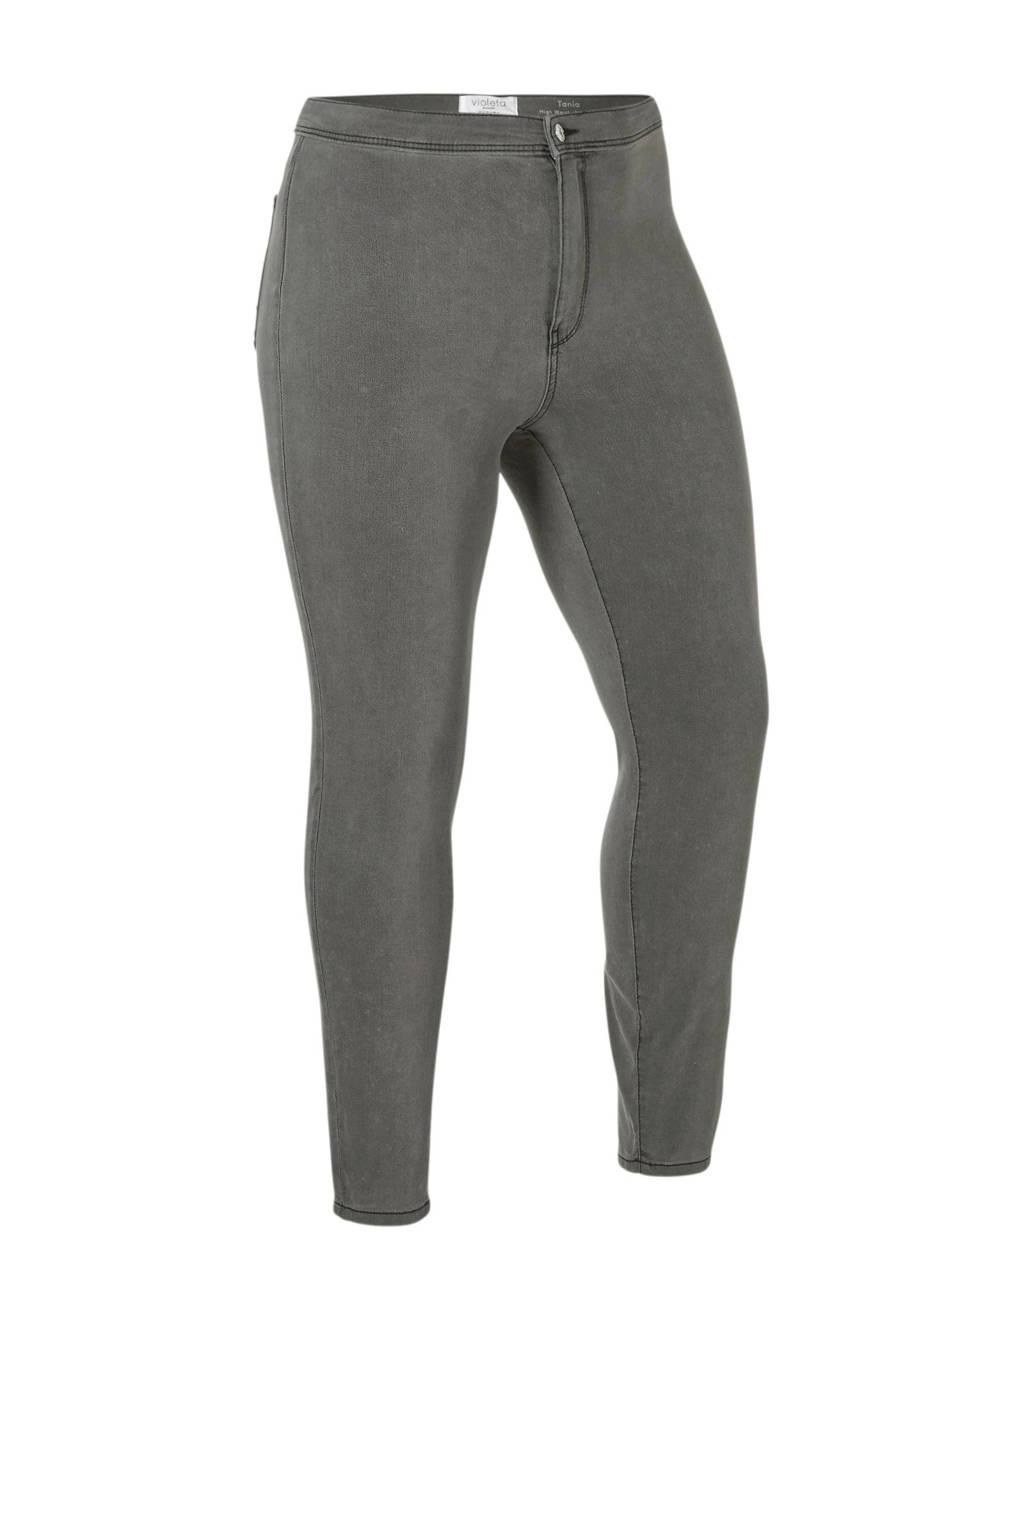 Violeta by Mango high waist skinny fit jegging grijs, Grijs